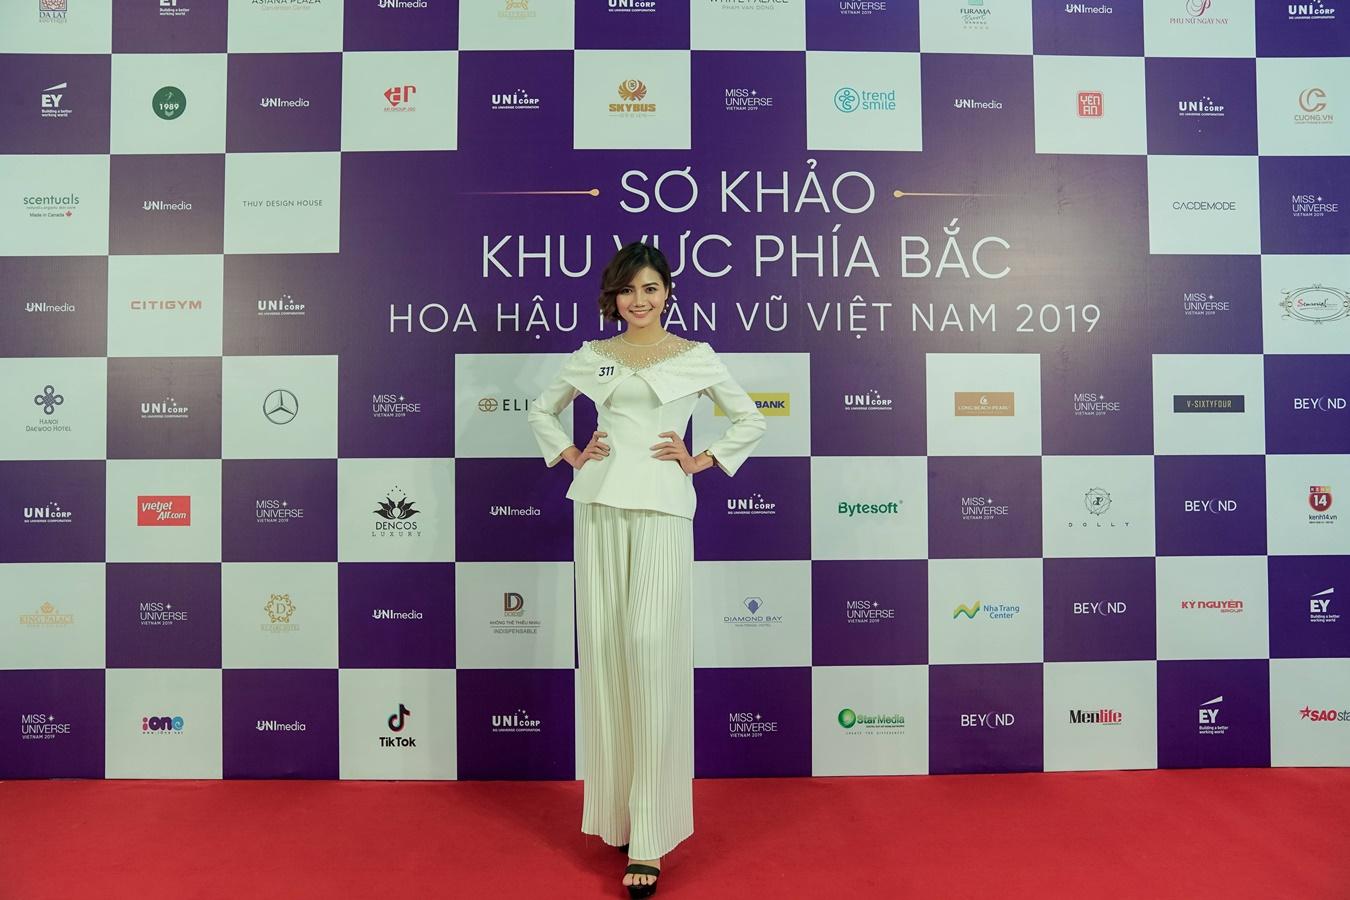 Thi sinh Hoa hau Hoan vu Viet Nam 2019 chup hinh o Backdrop (65)